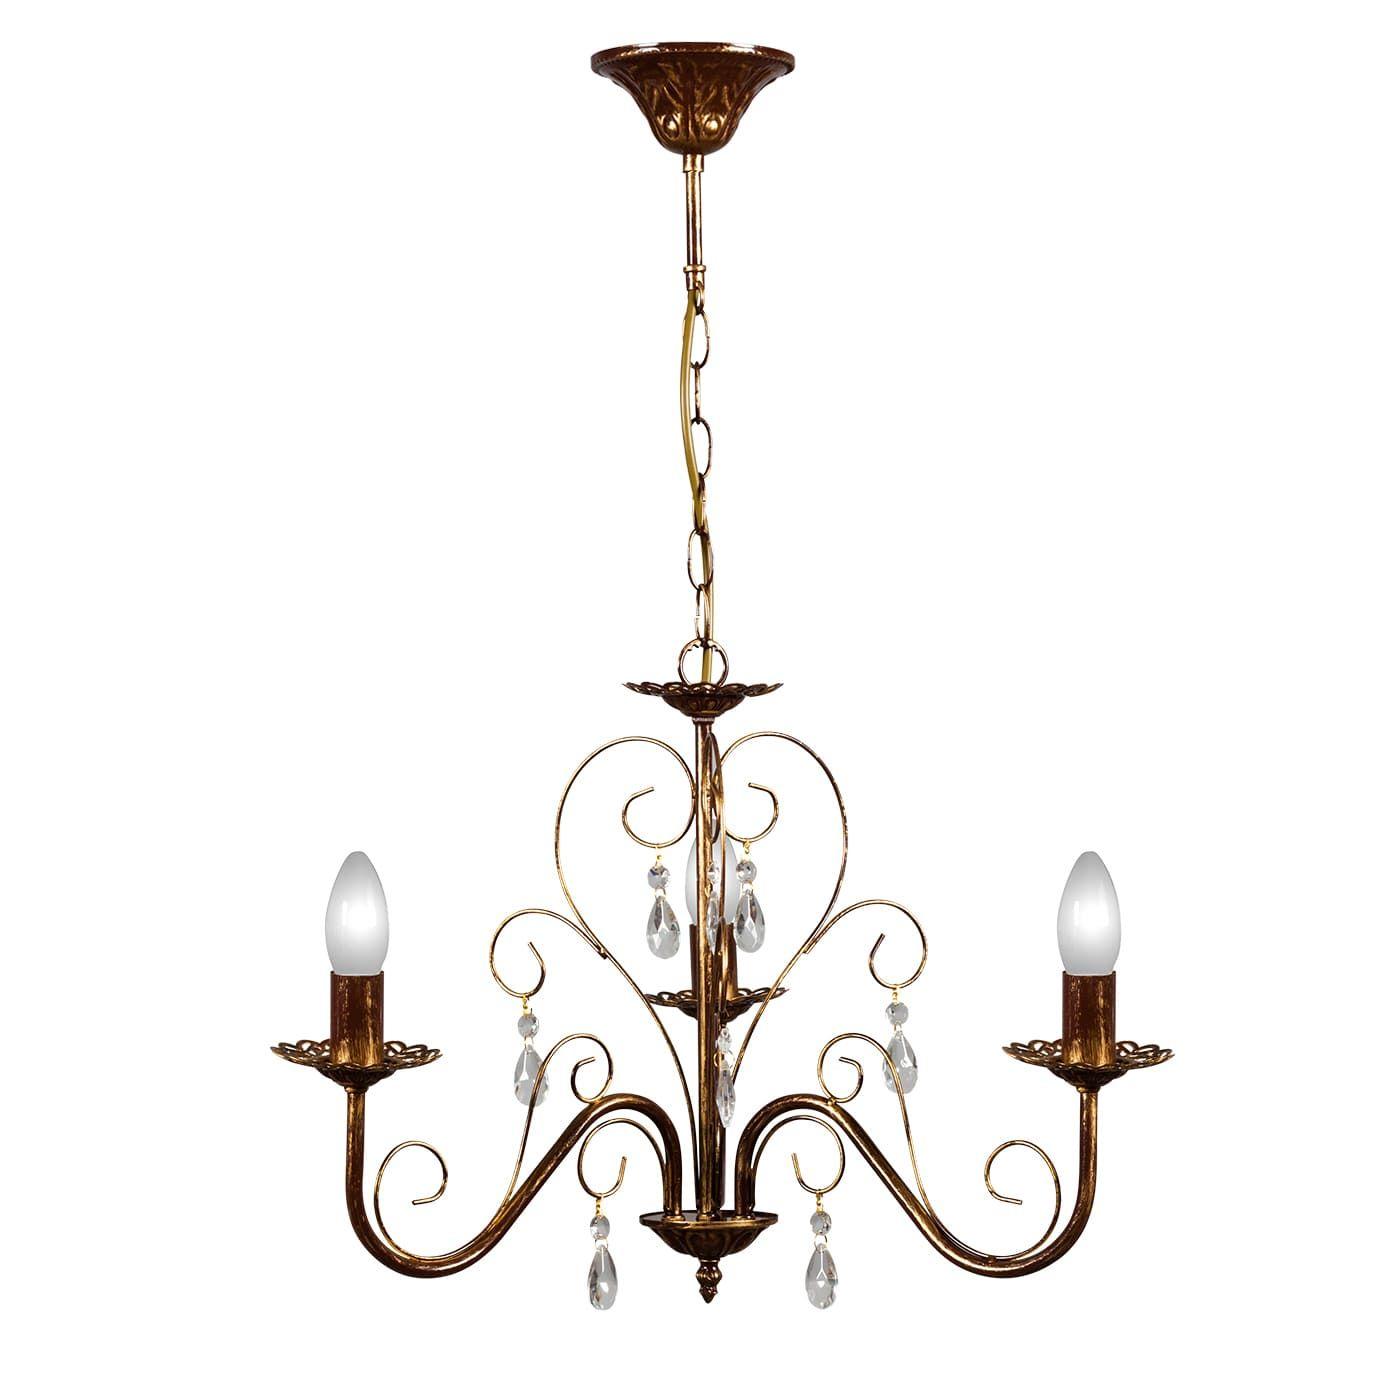 PETRASVET / Pendant chandelier S1024-3, 3xE14 max. 60W